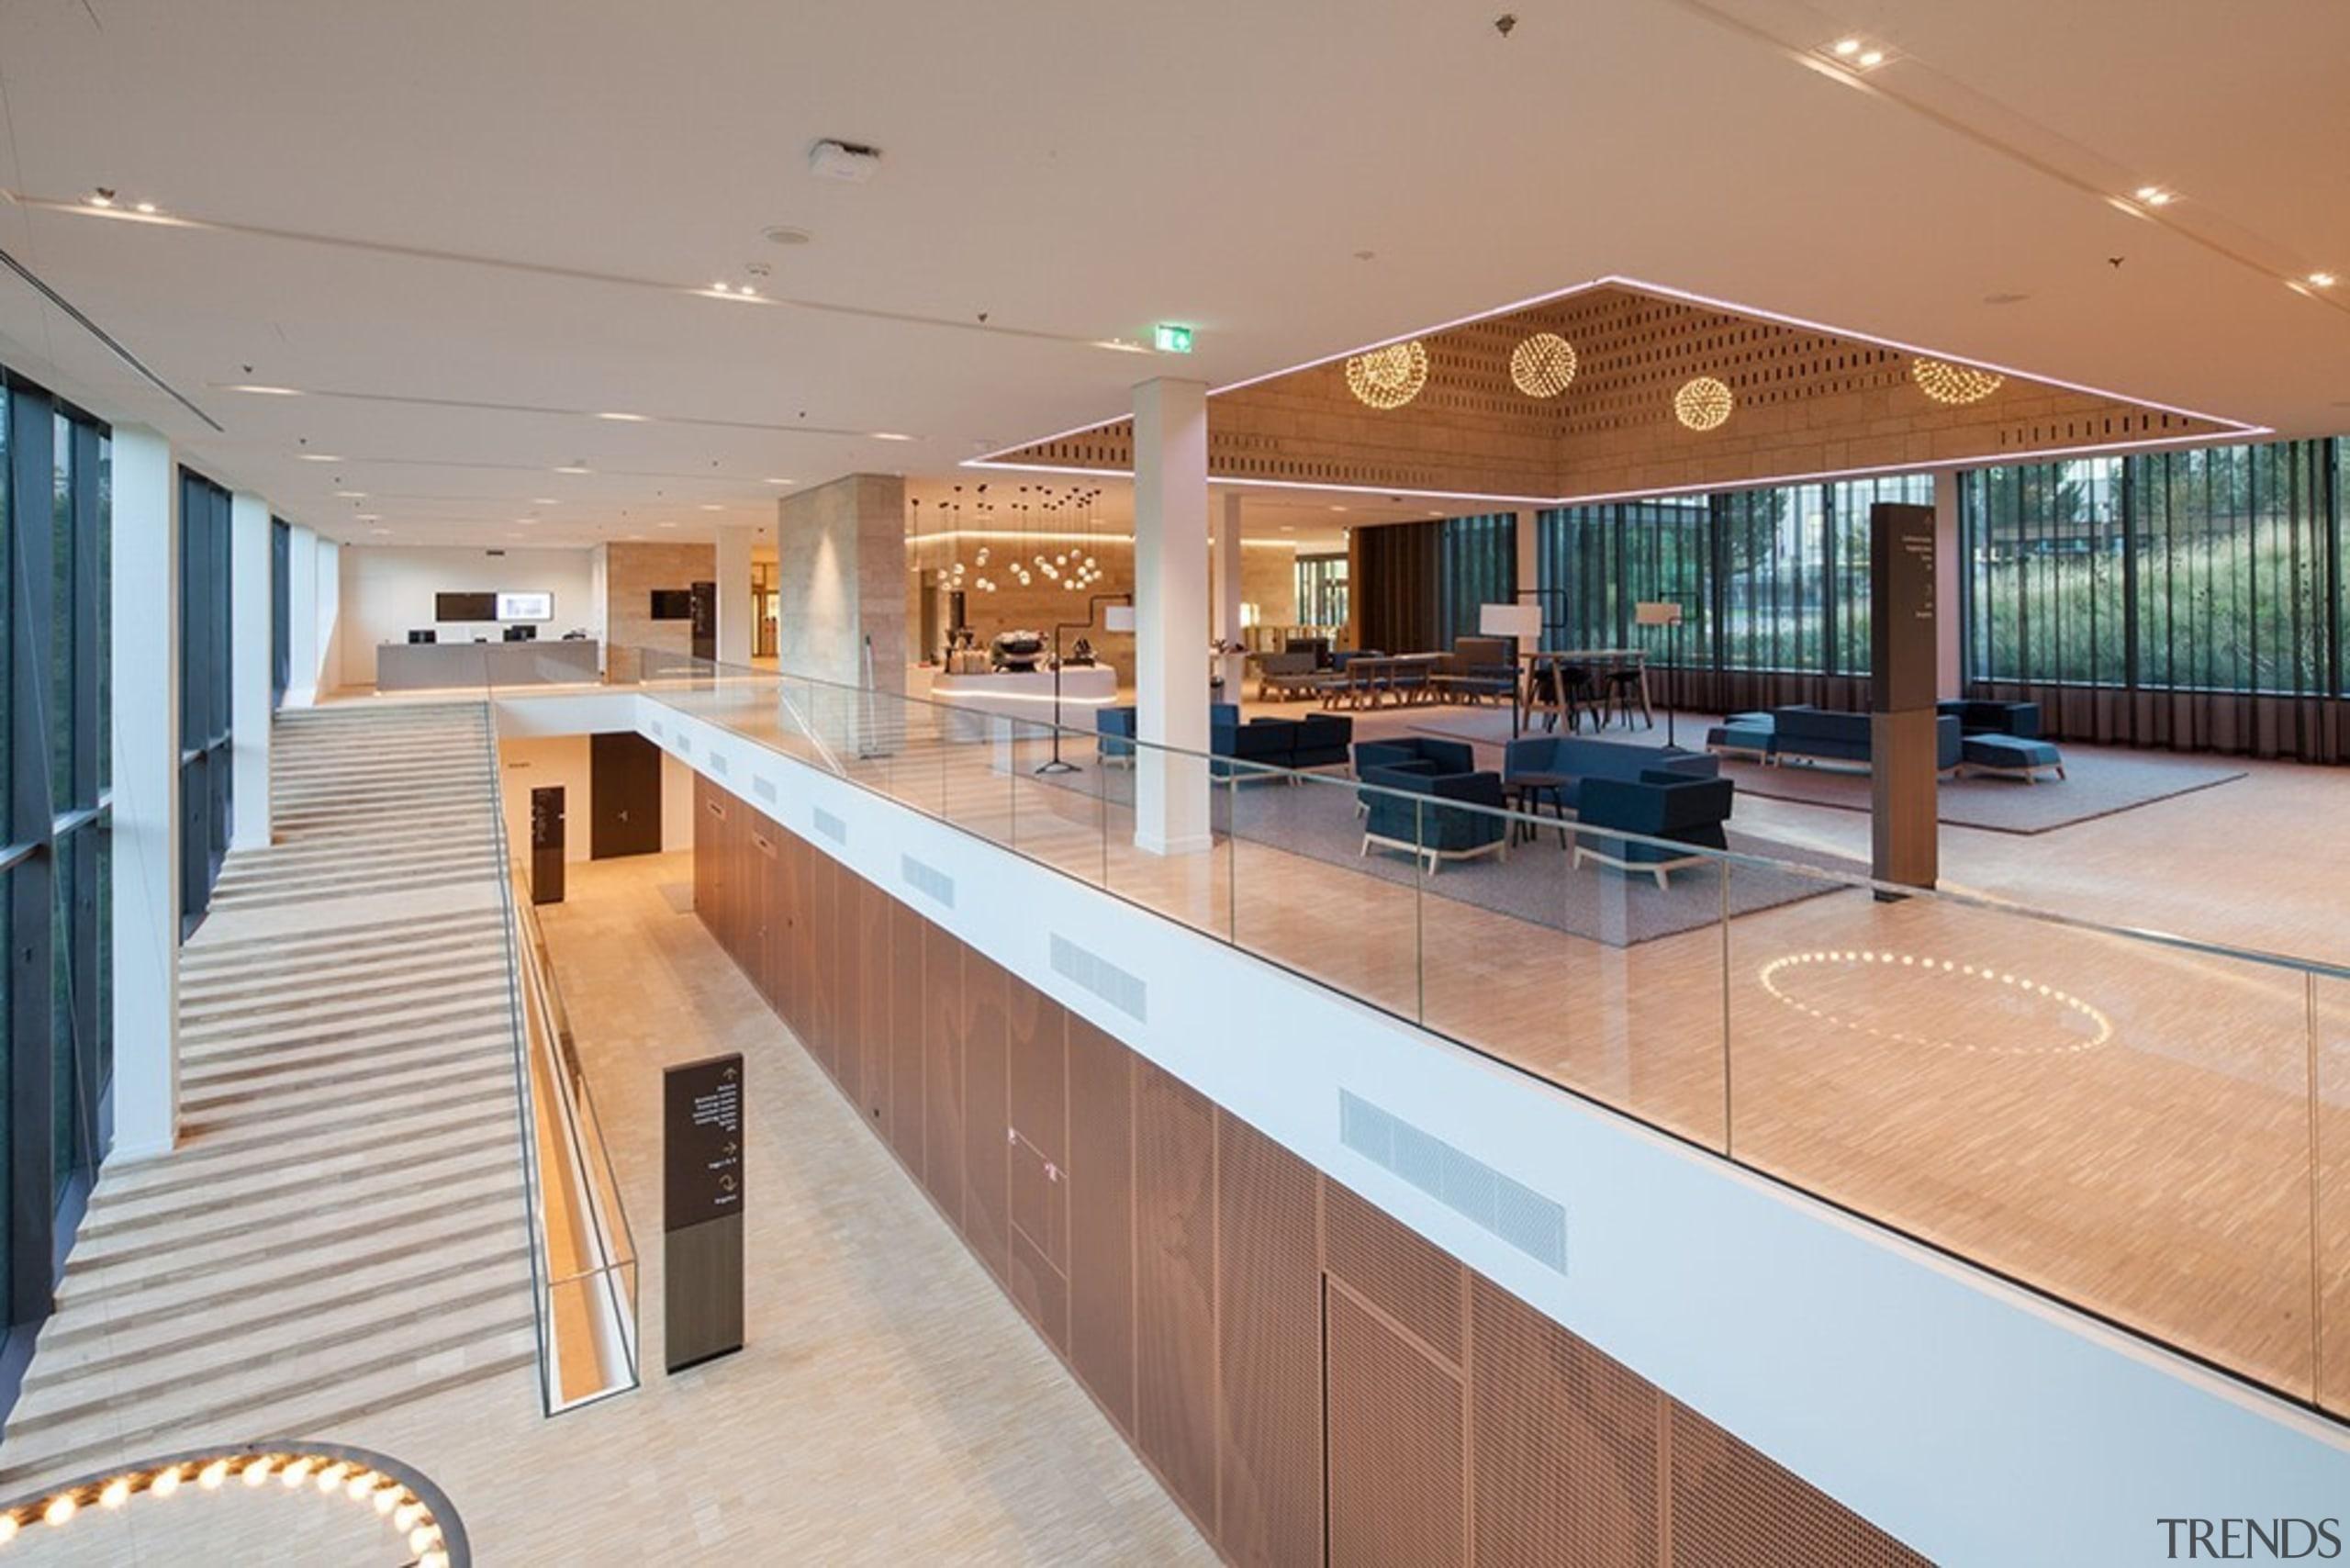 Eurojust - estate | interior design | leisure estate, interior design, leisure centre, lobby, real estate, gray